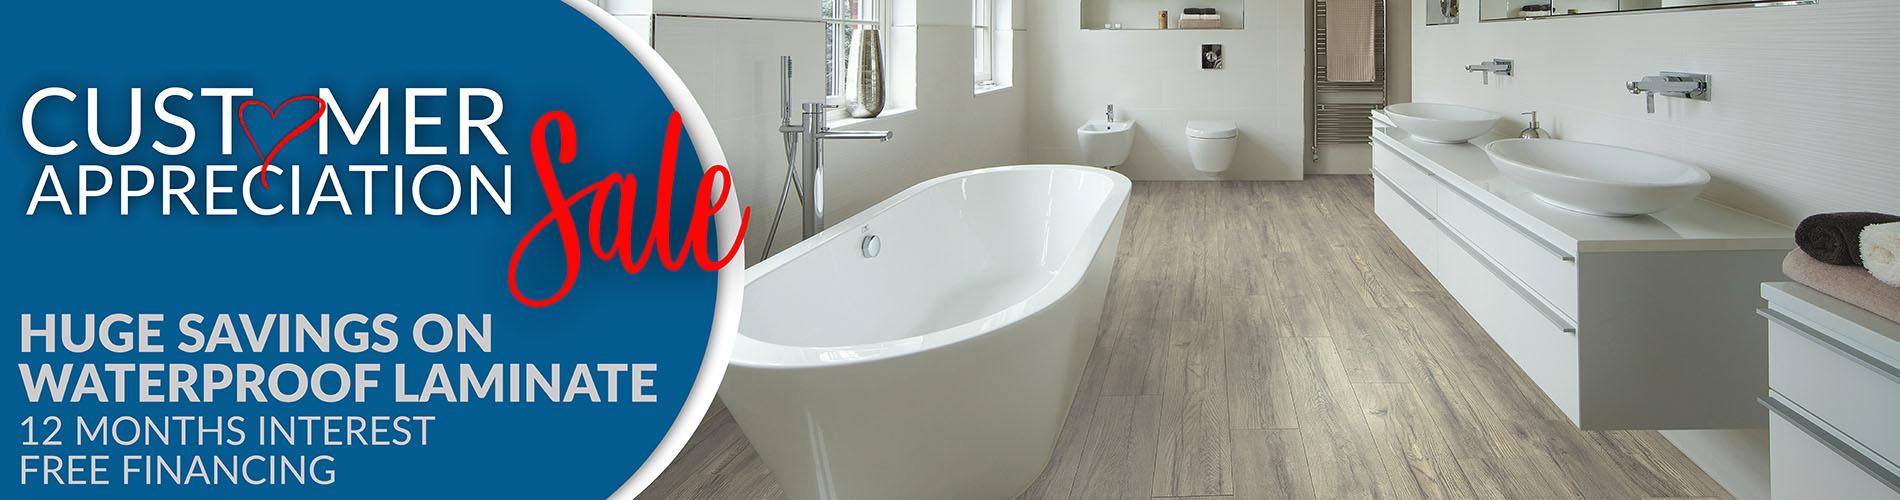 Customer Apperciation Sale - Huge Savings on Waterproof Laminate - 12 Months Interest Free Financing